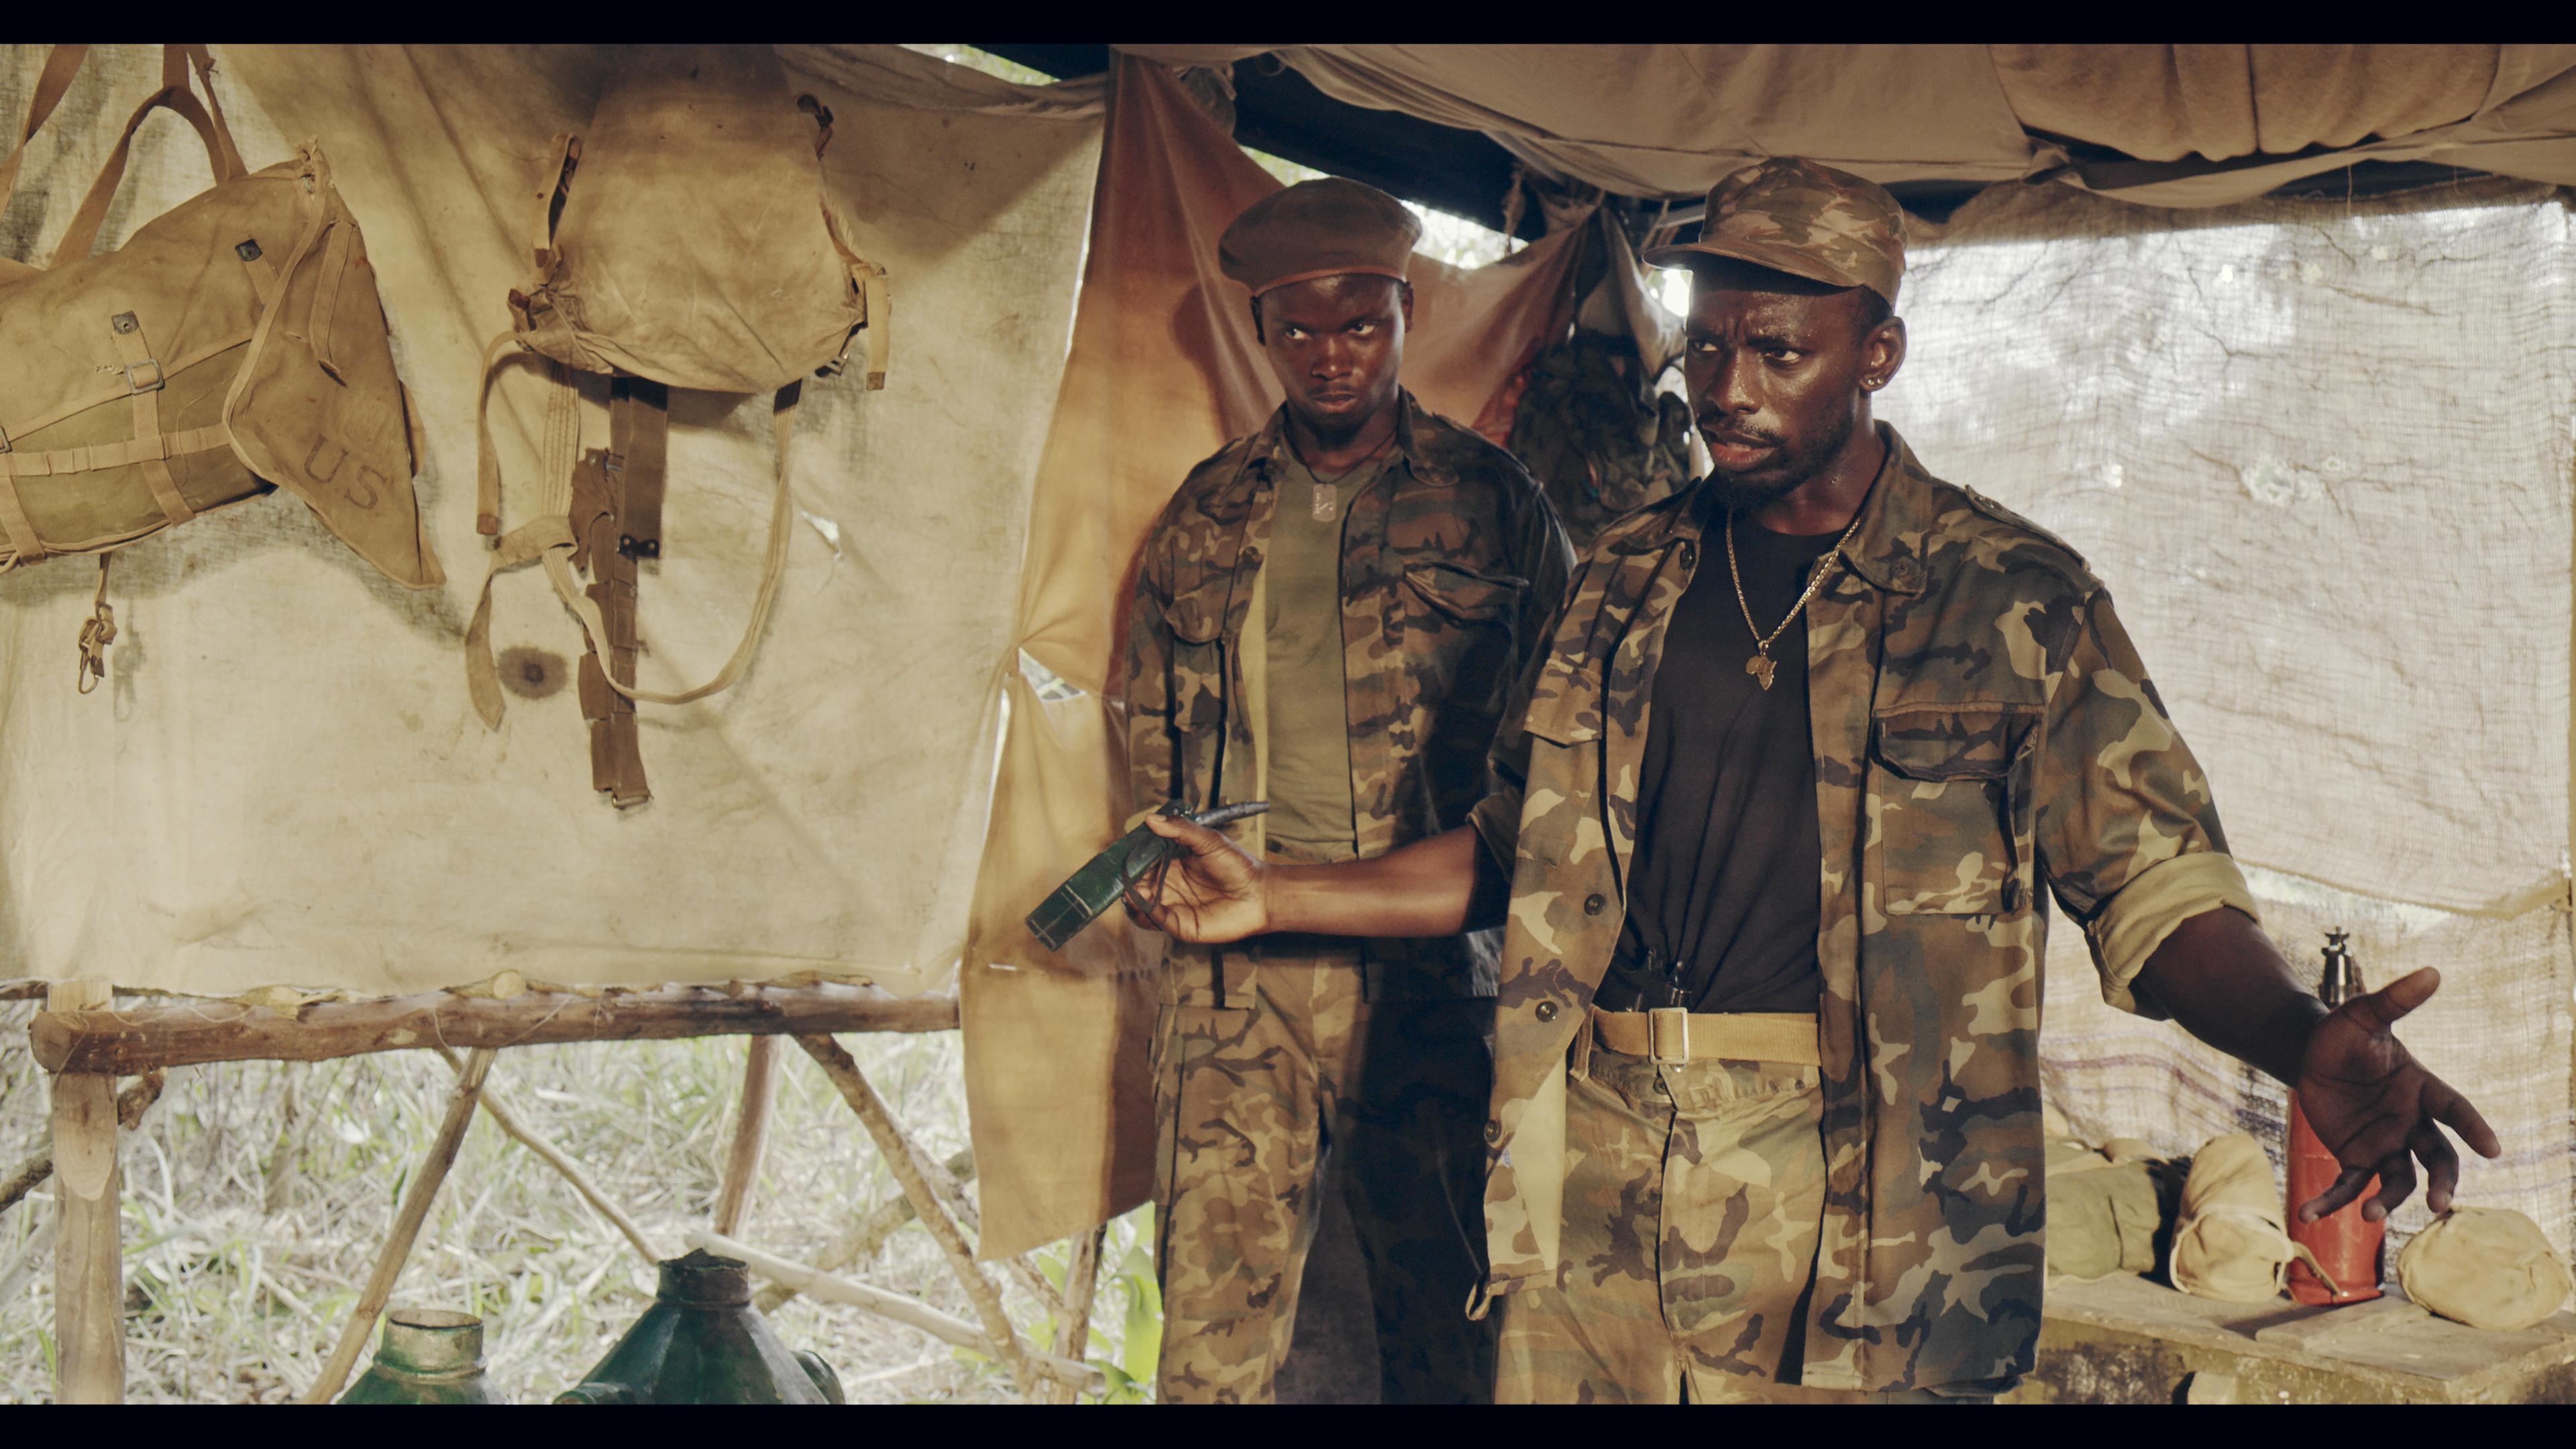 Jonathan Mubanda and Cedric Keka Shako in Charity (2020)